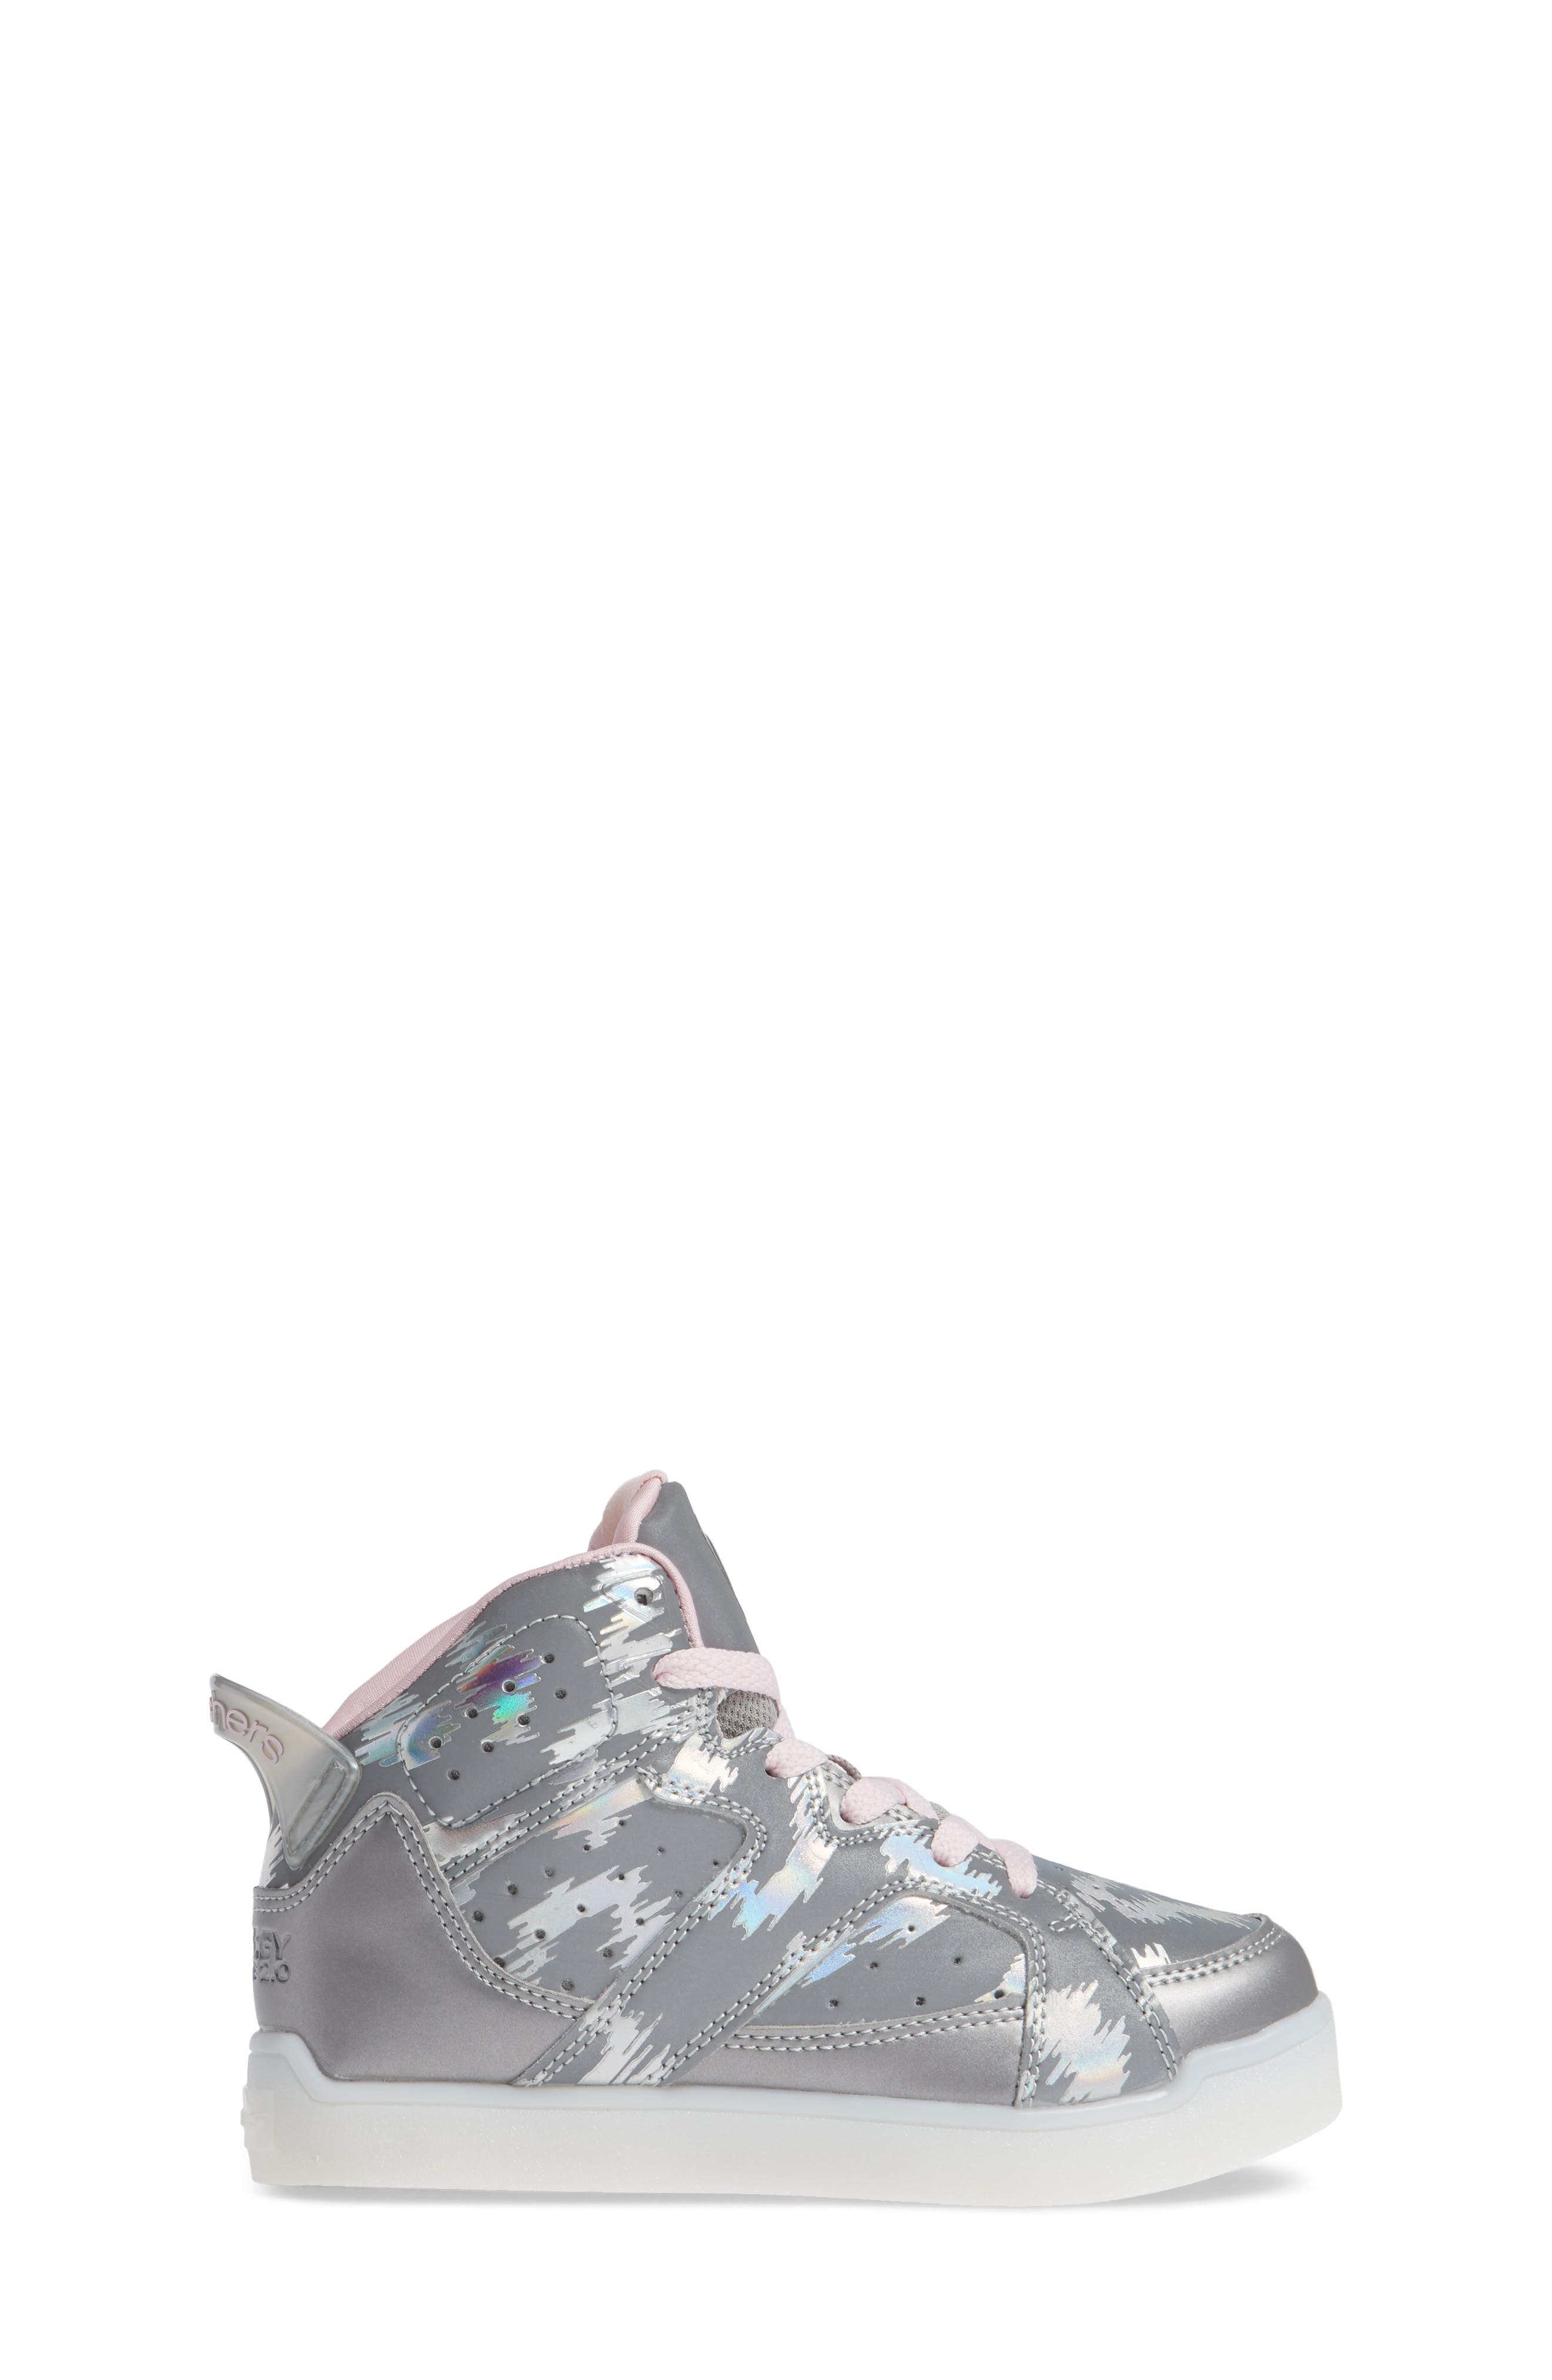 SKECHERS,                             Energy Lights Pro Reflecti-Fab Sneaker,                             Alternate thumbnail 3, color,                             040